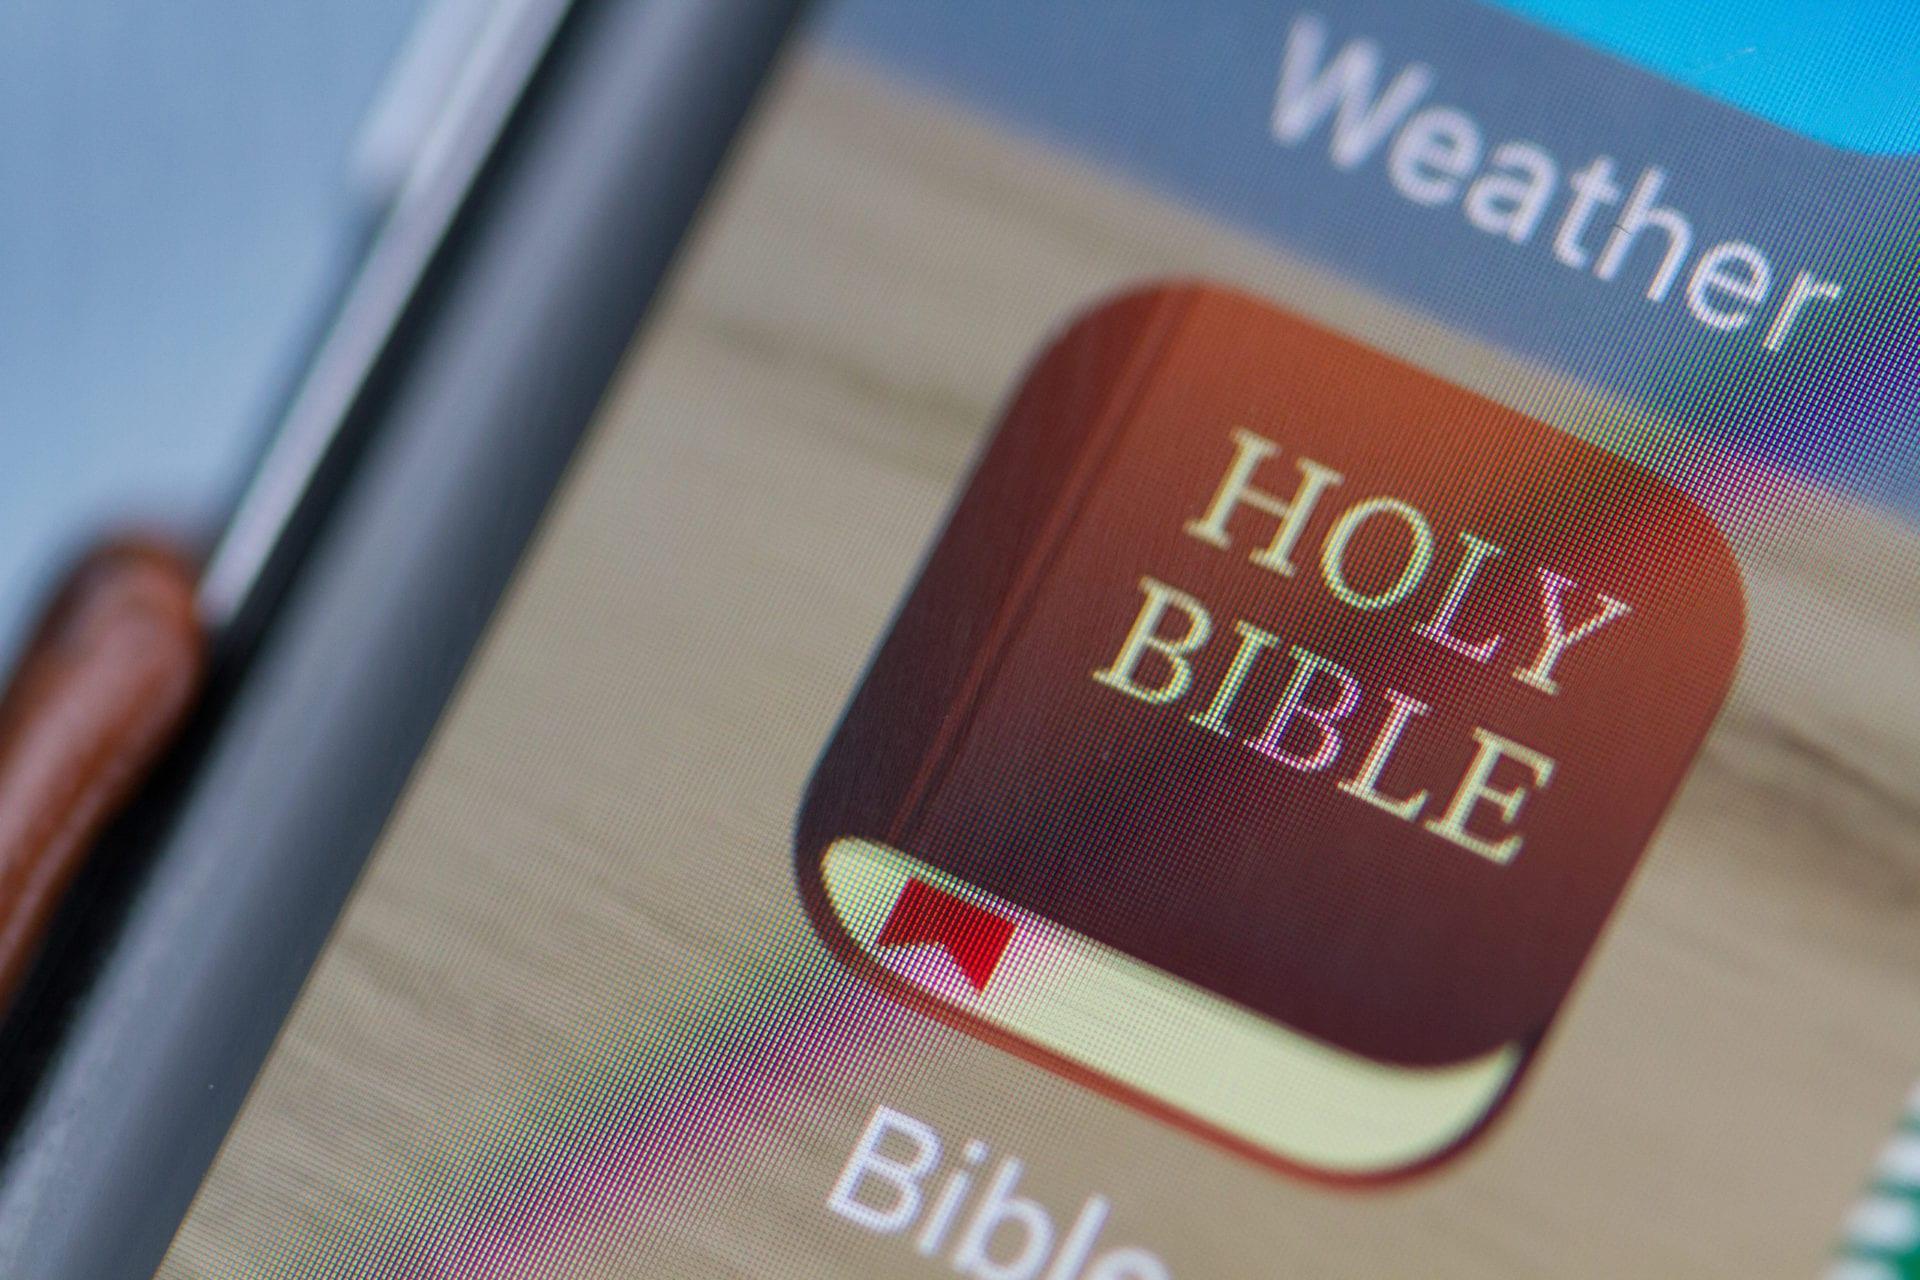 Ketika Alkitab Menjadi Instagram